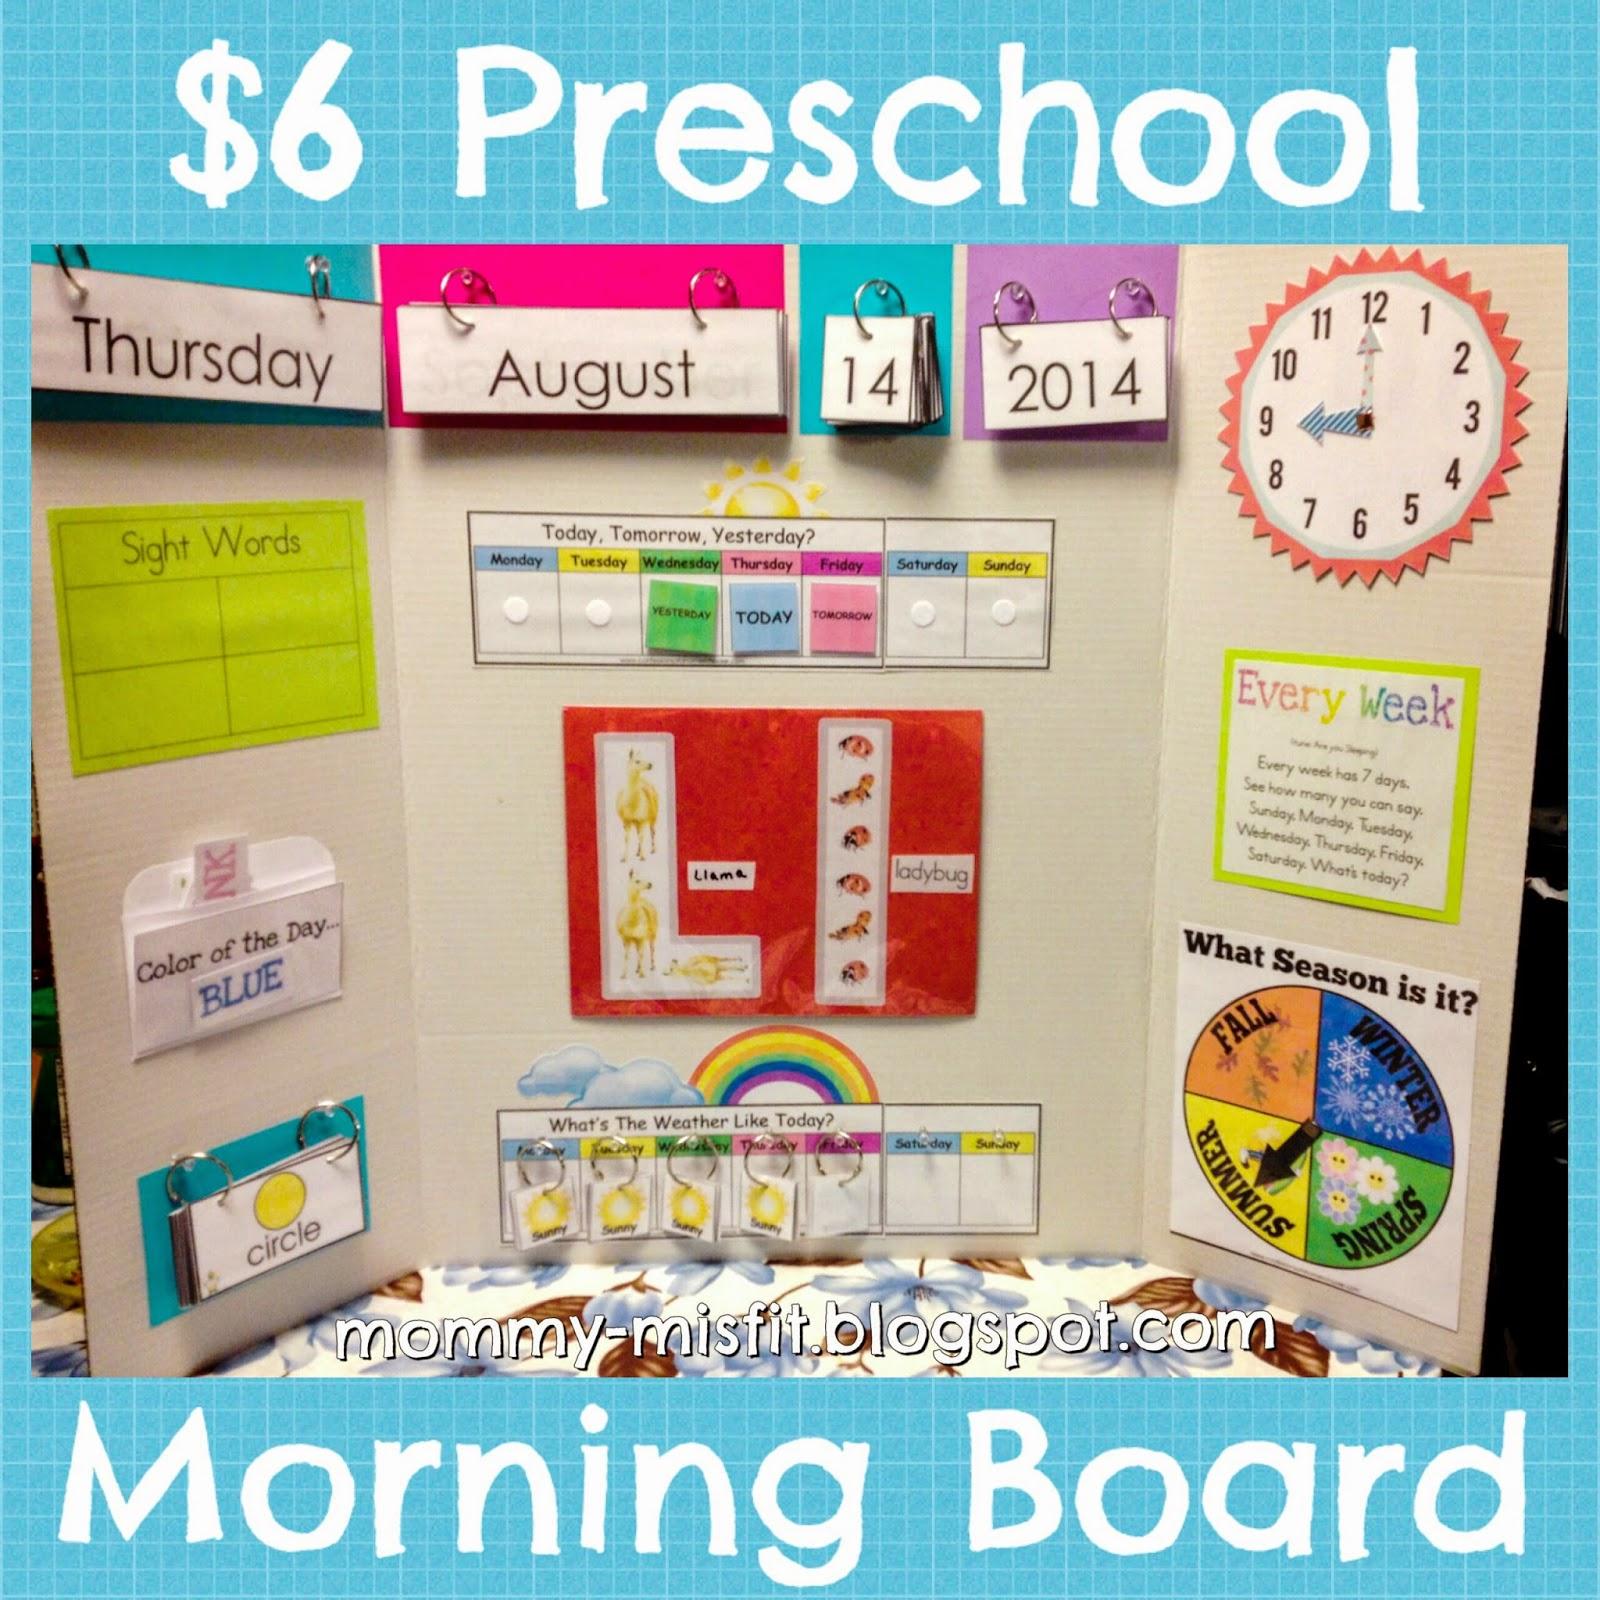 Calendar Activities For Preschoolers : Mommy misfit our cheap morning calendar board yo